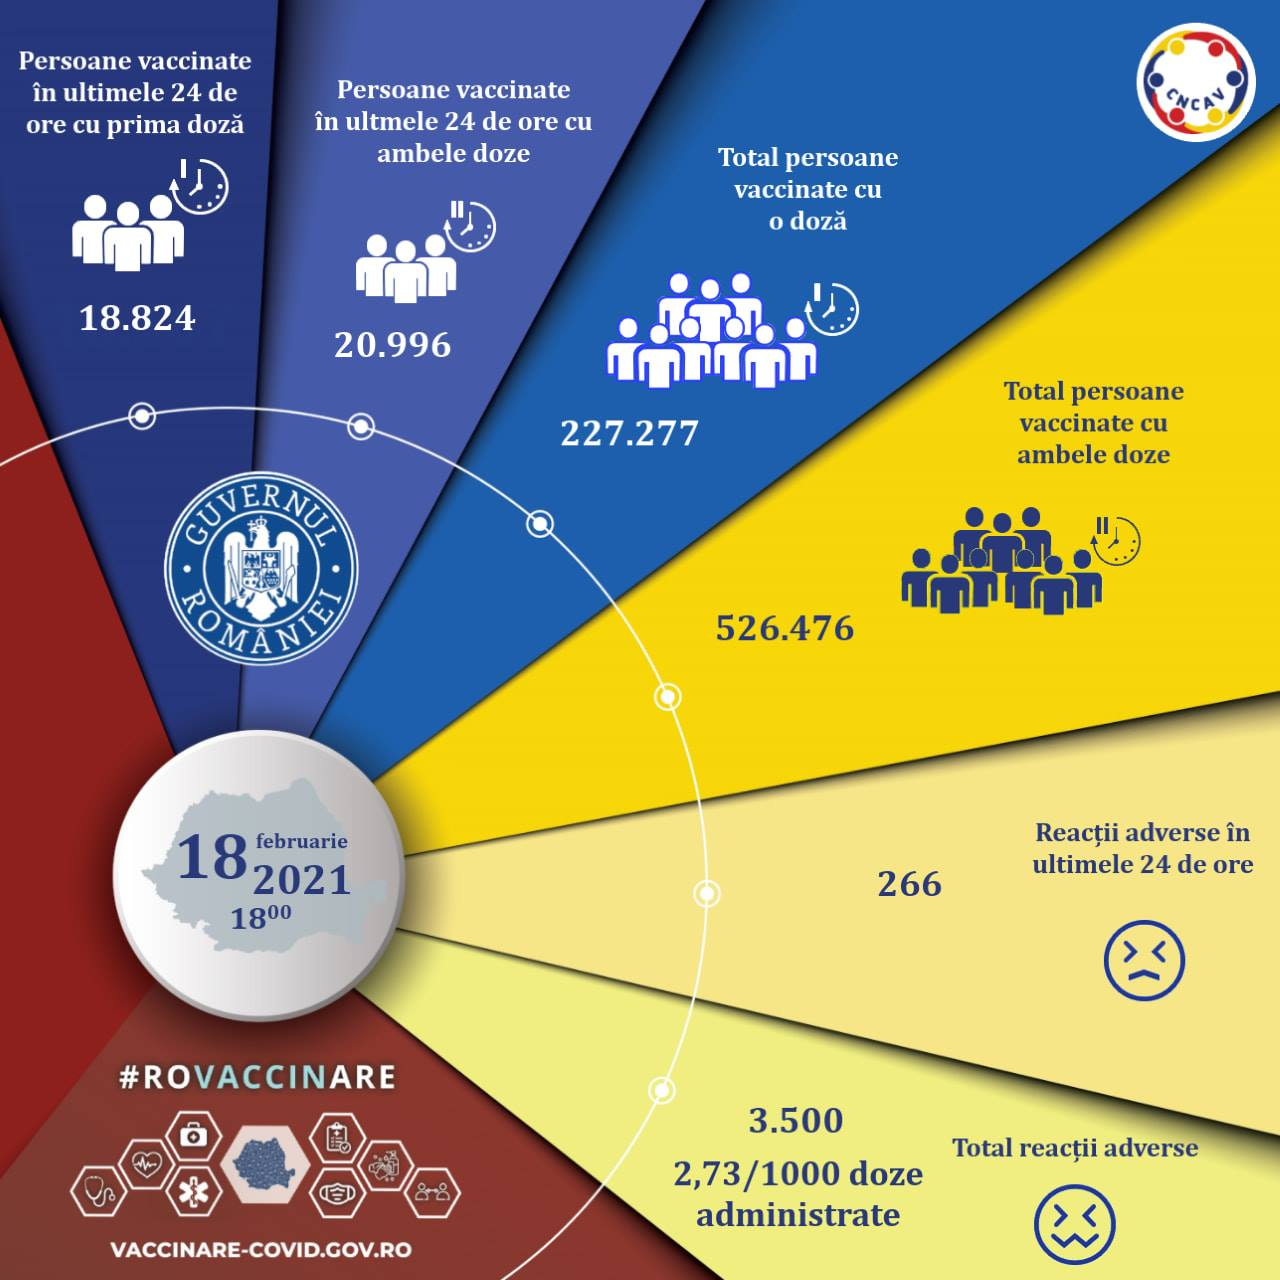 Guvernul Romaniei Vaccinari 18 Februarie centre